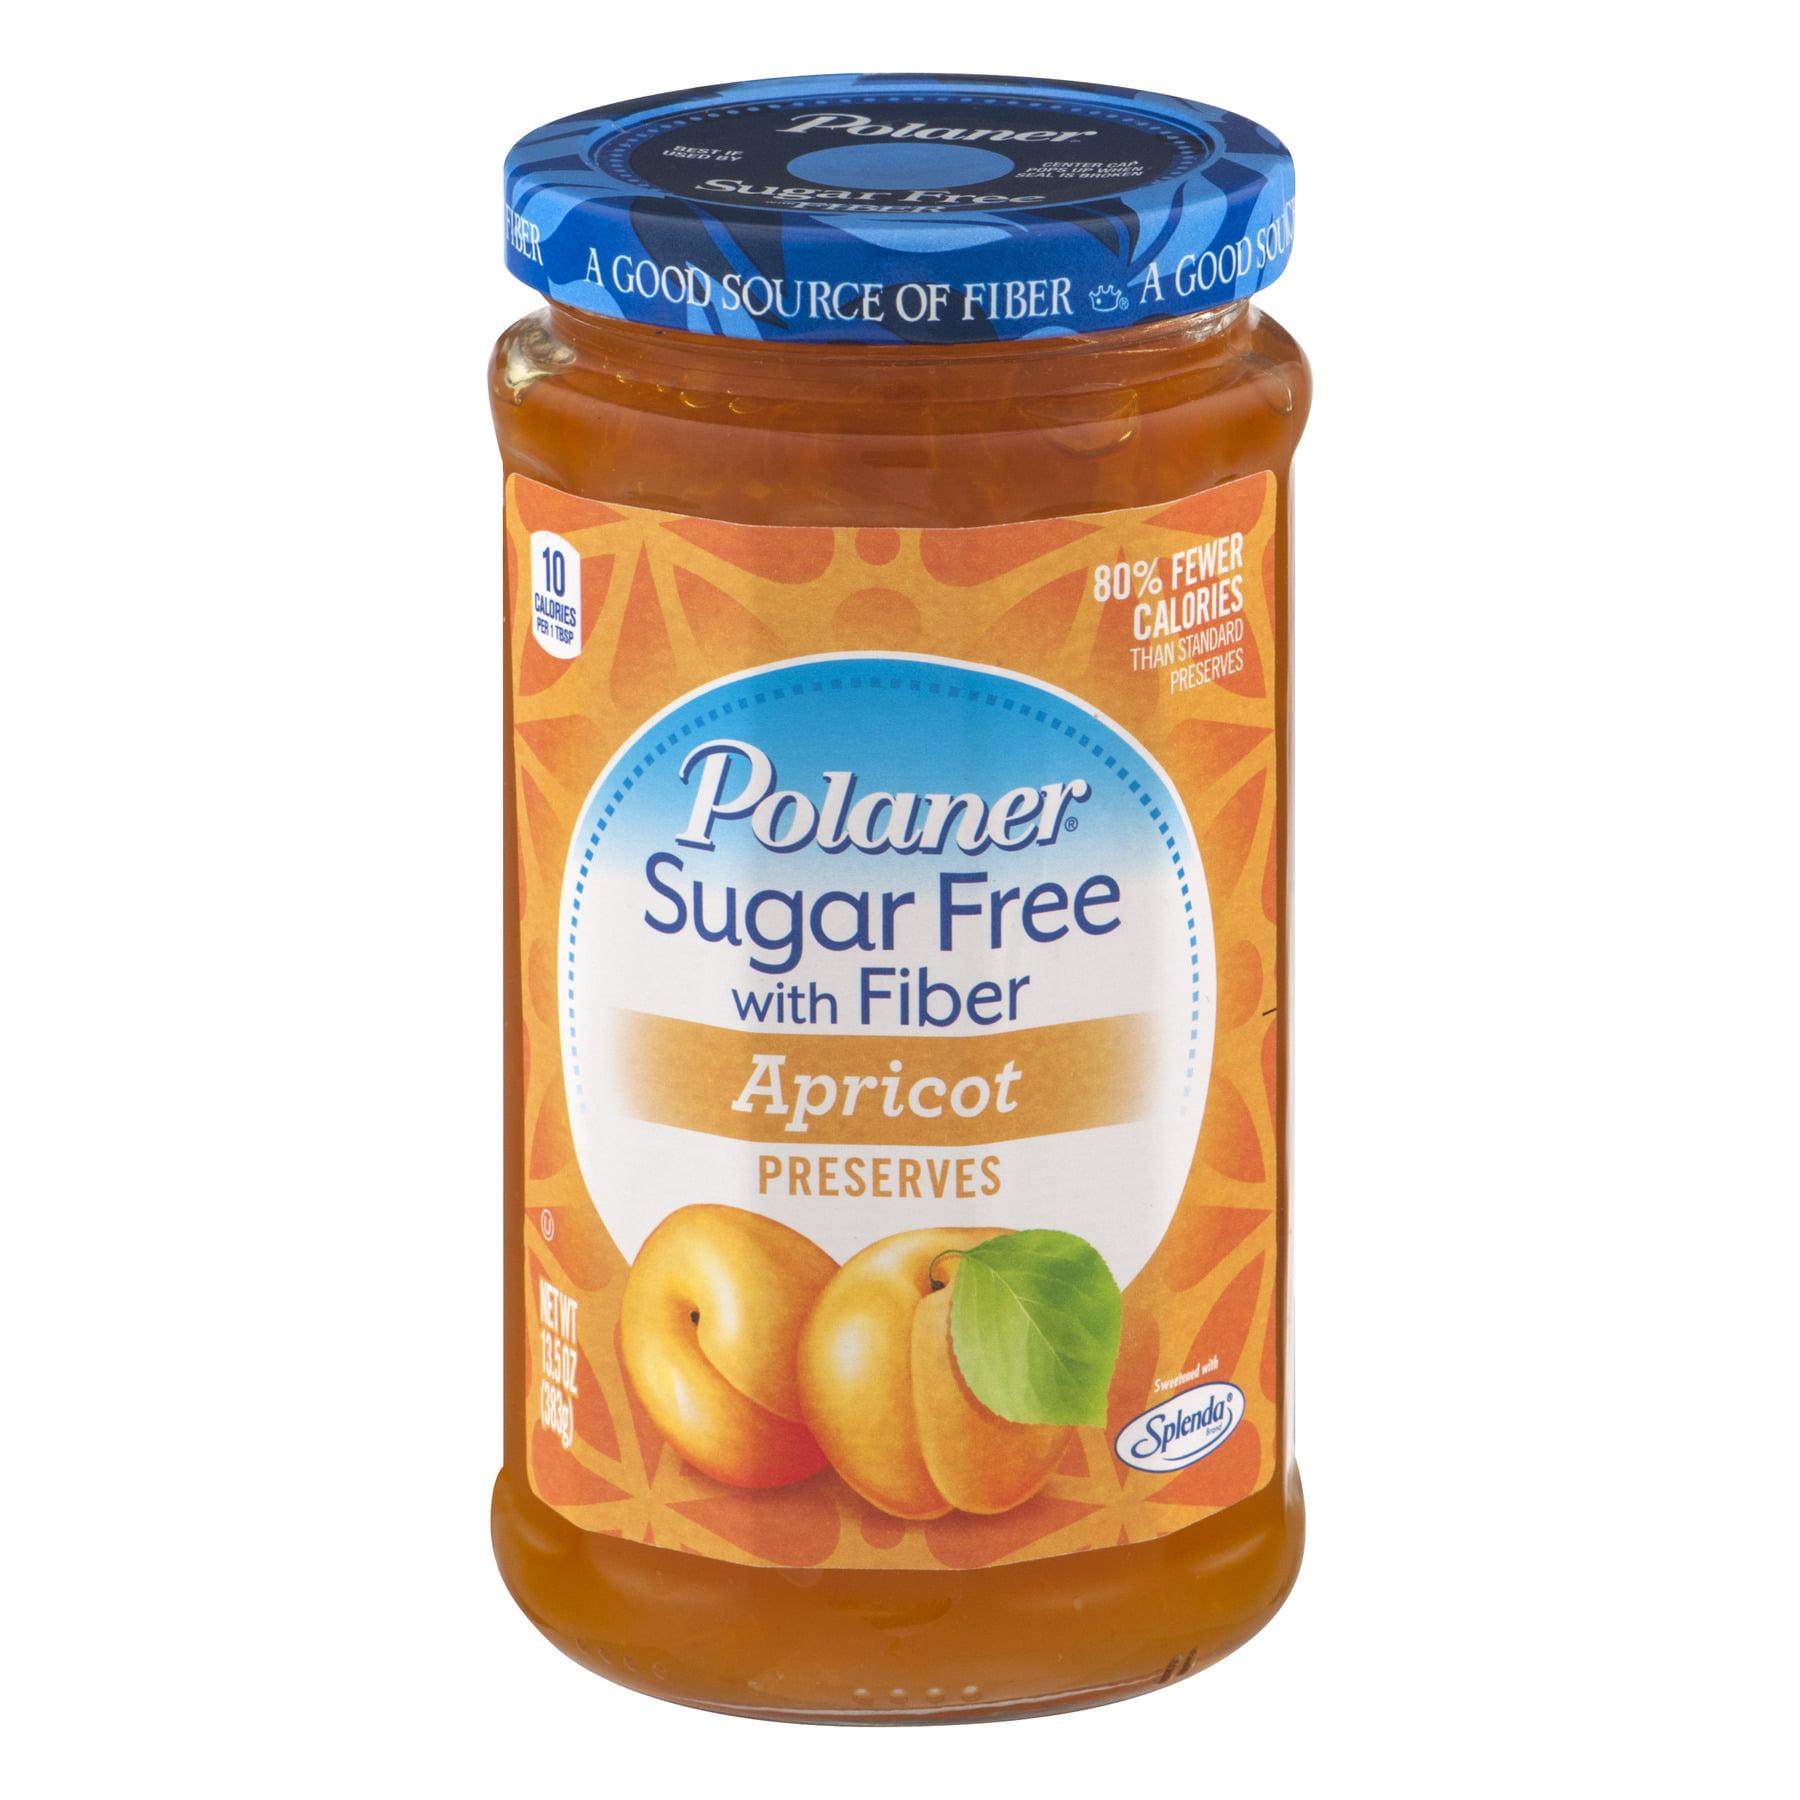 Polaner Sugar Free with Fiber Apricot Preserves, 13.5 OZ